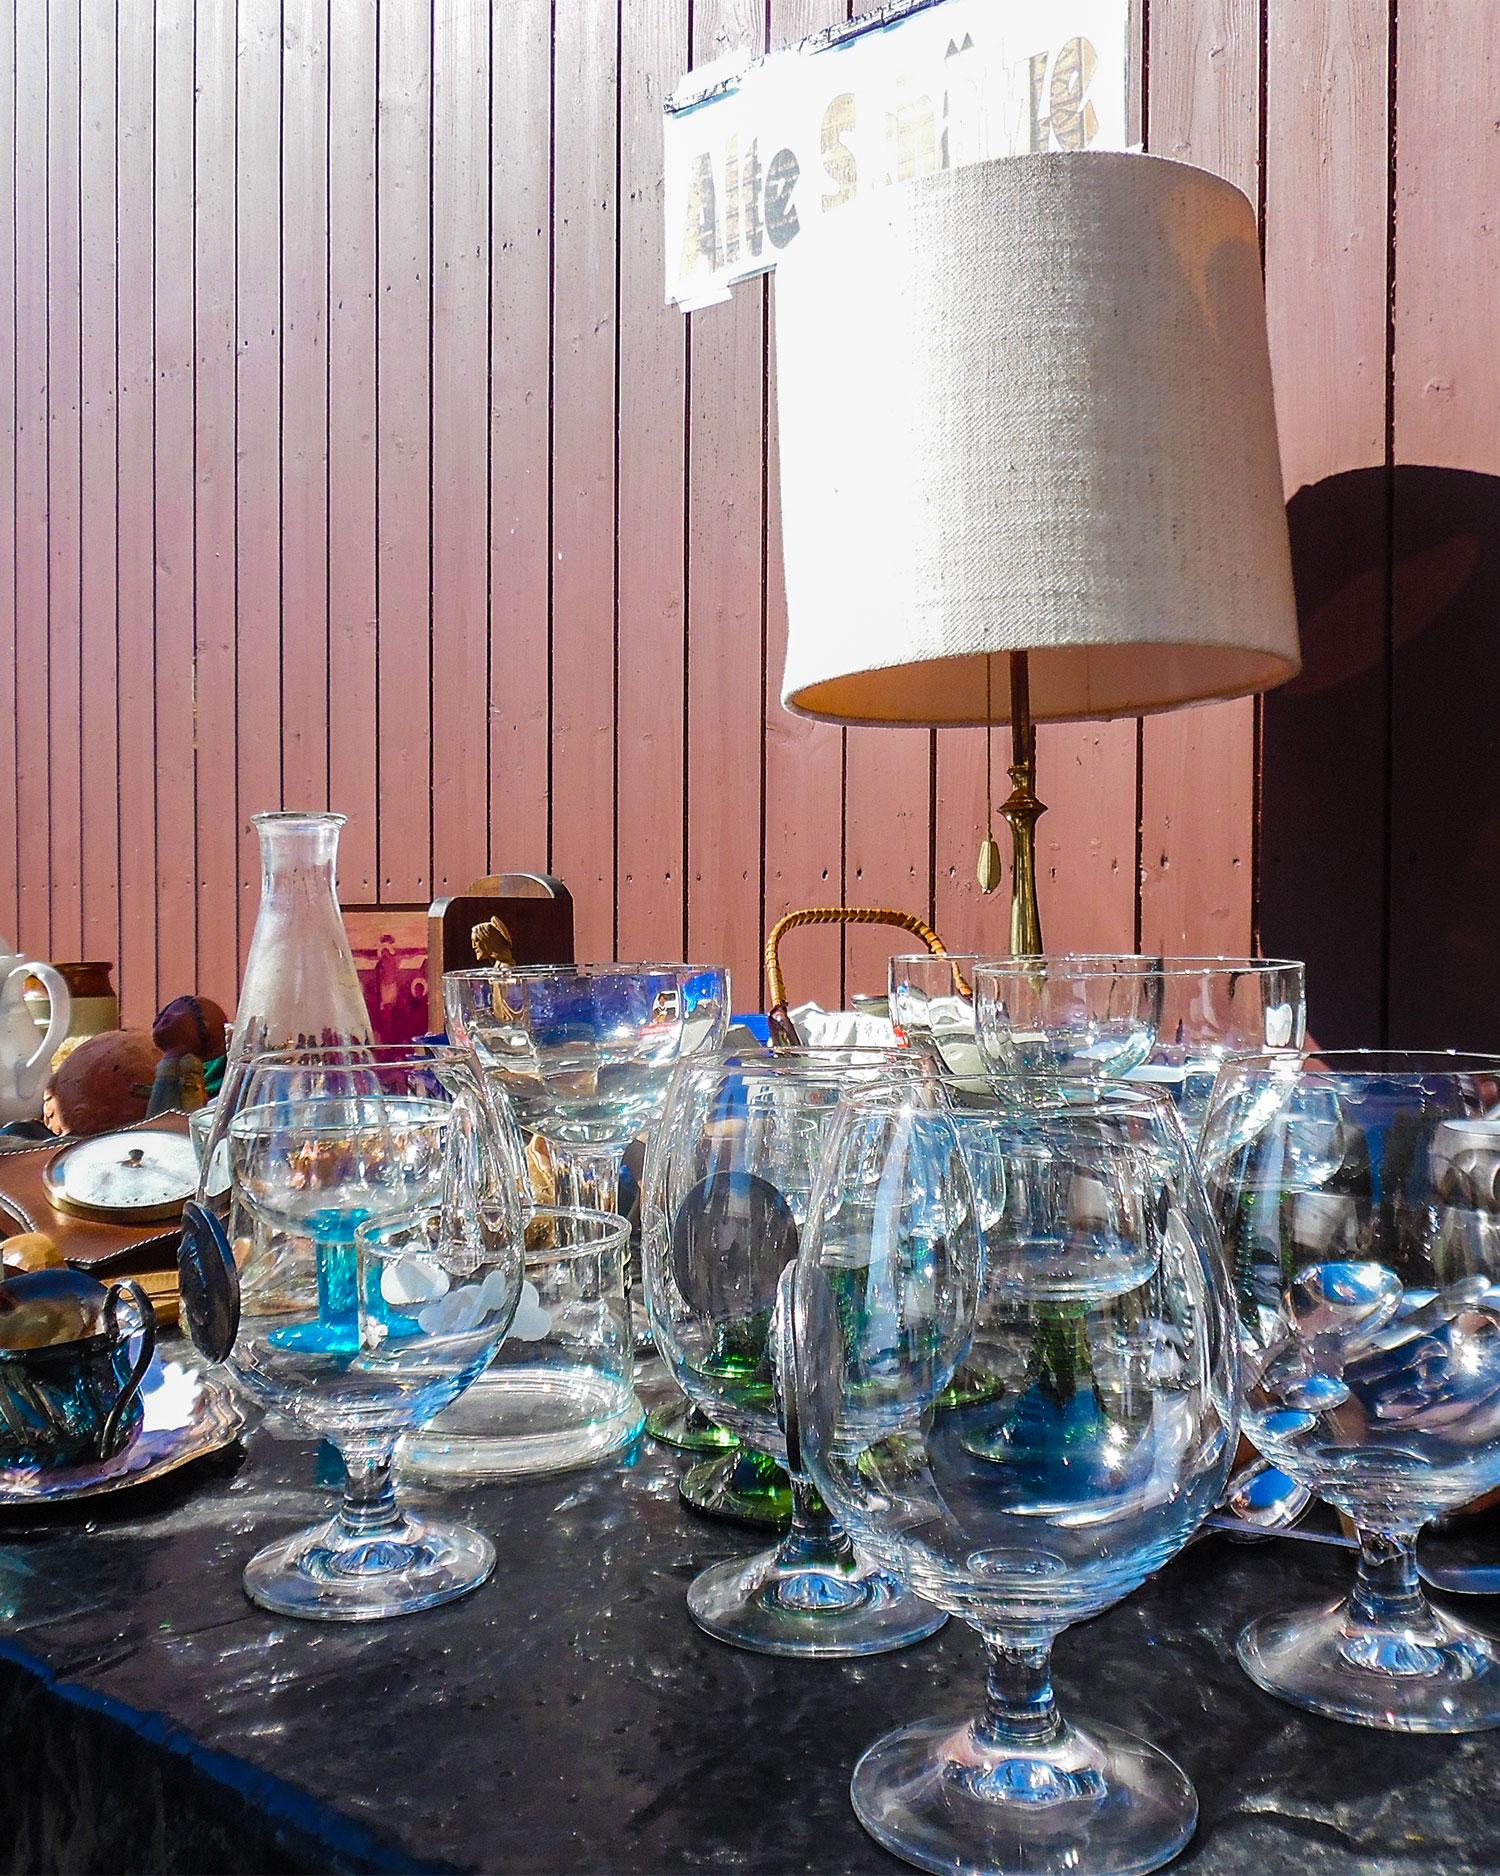 abtei-gerleve-flohmarkt-2-1500px